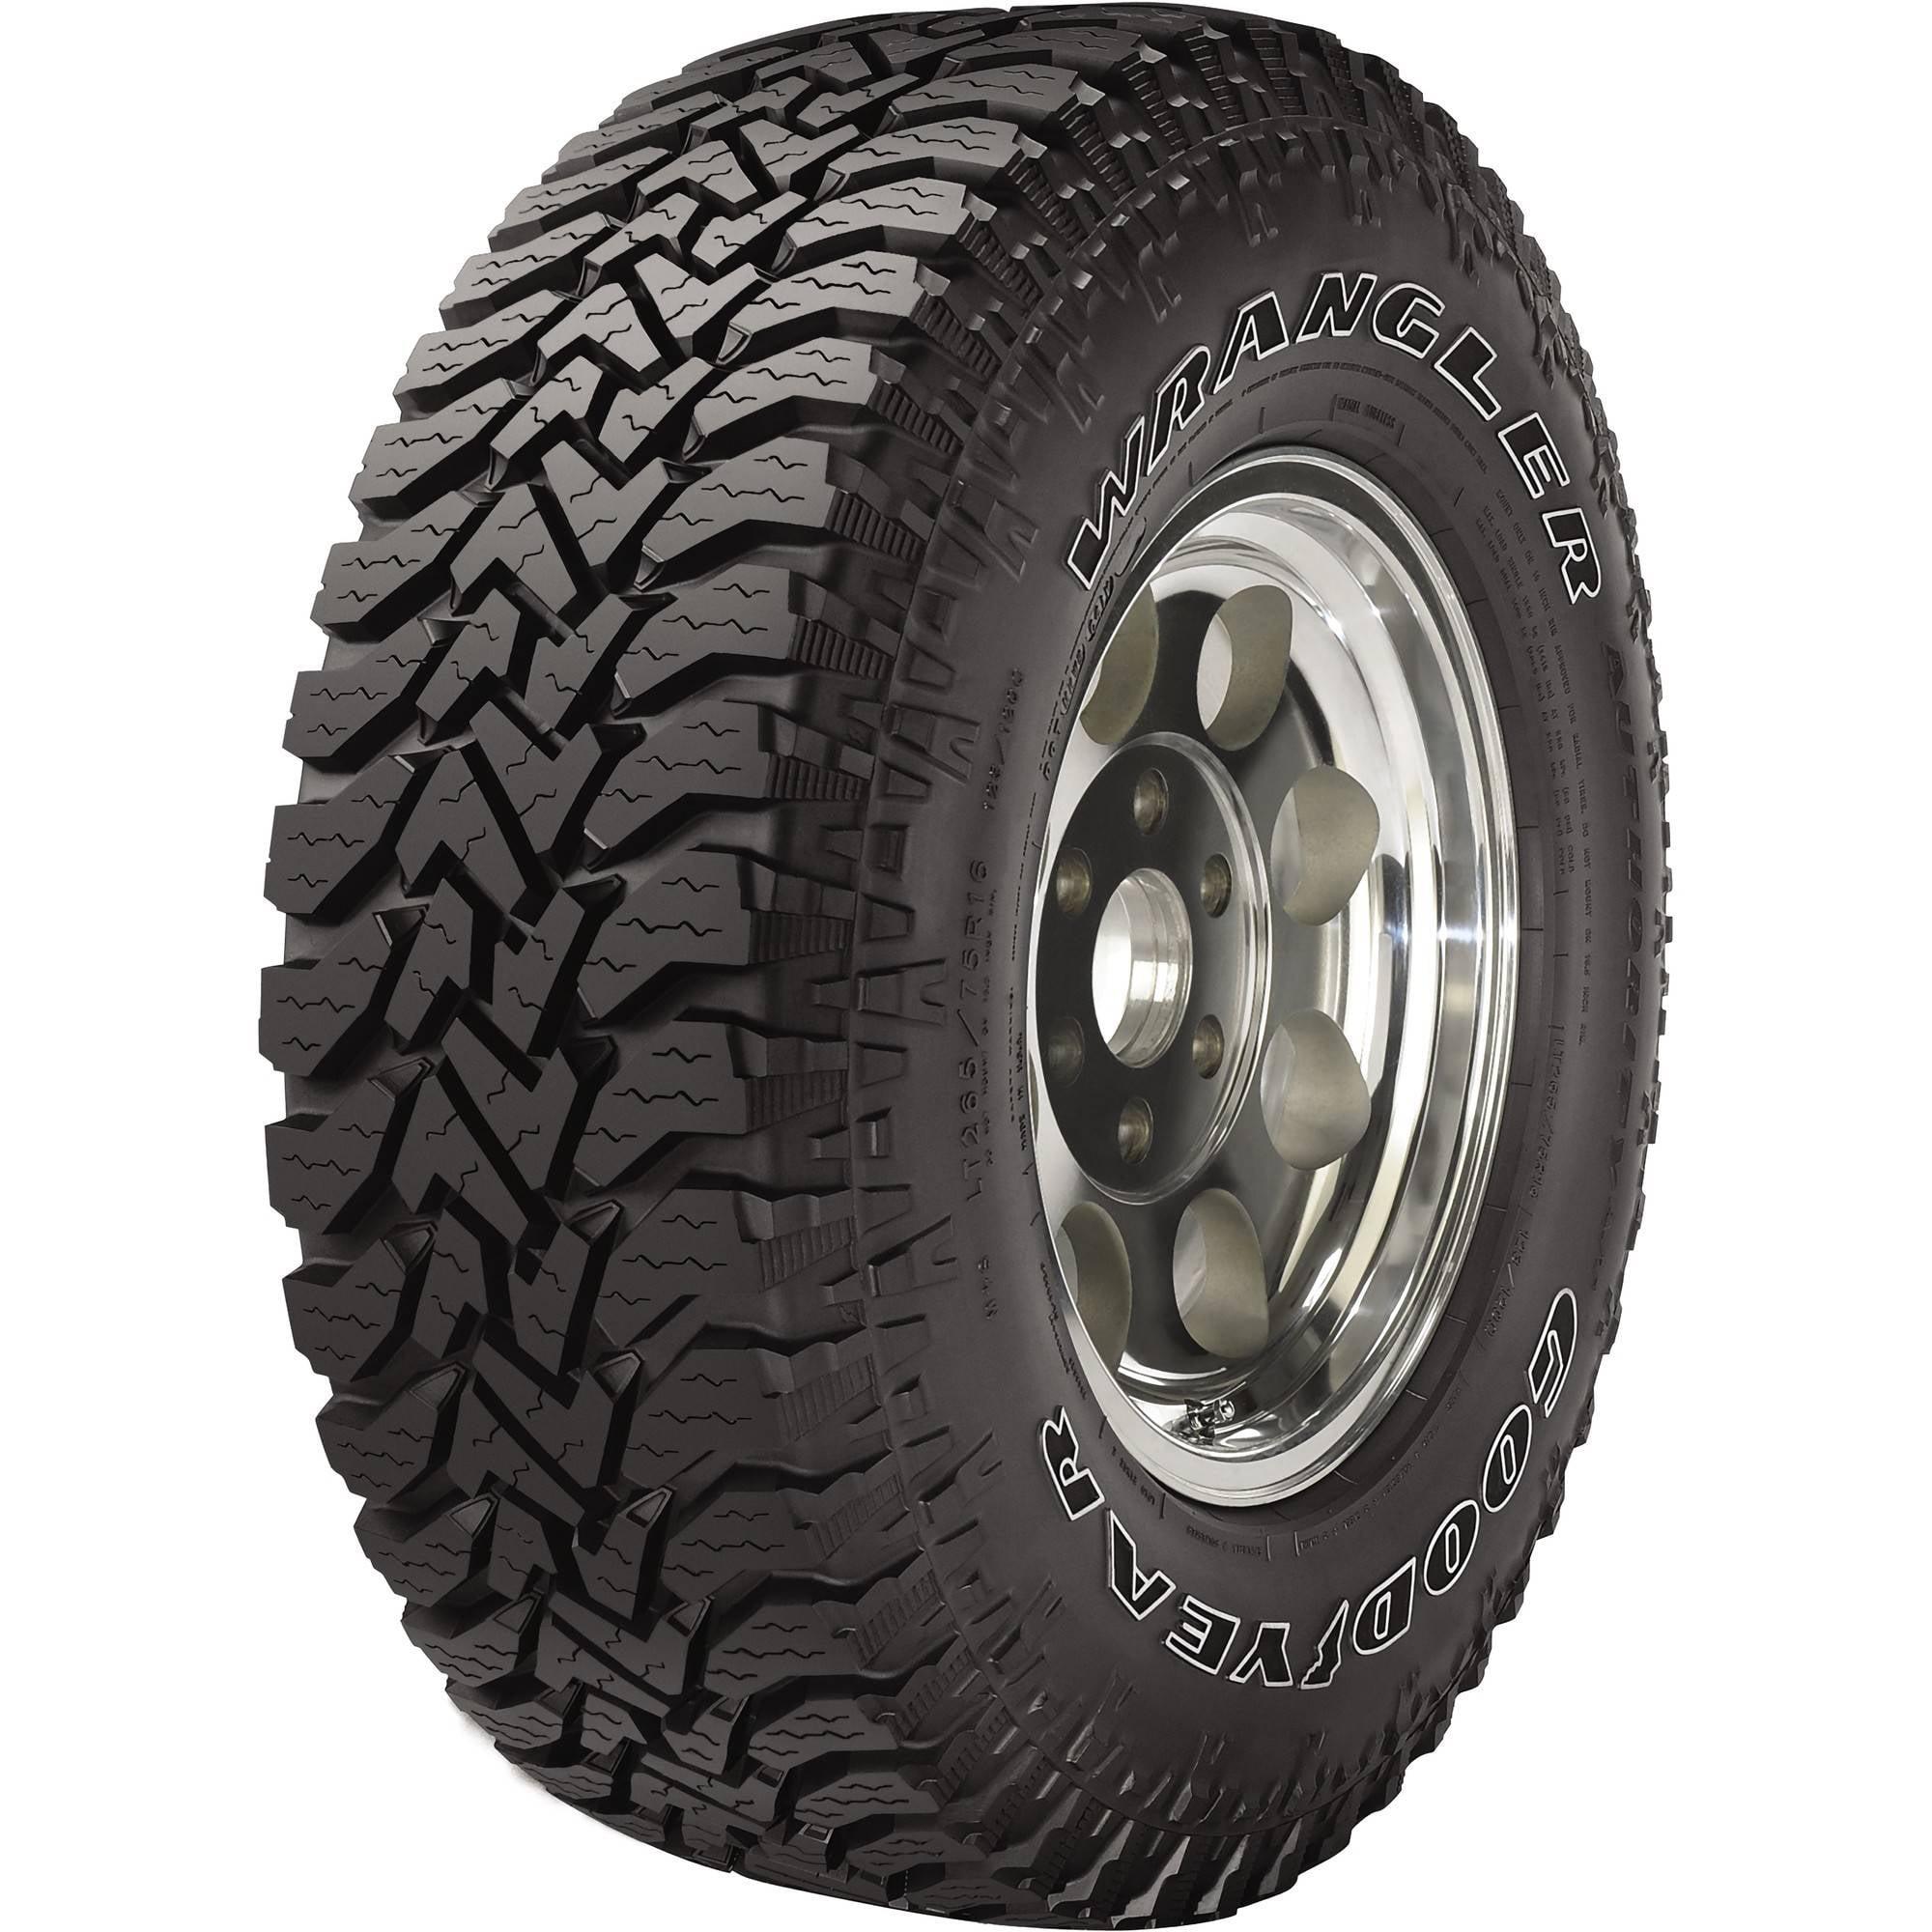 Goodyear Wrangler Authority Tire LT265/75R16E 123Q